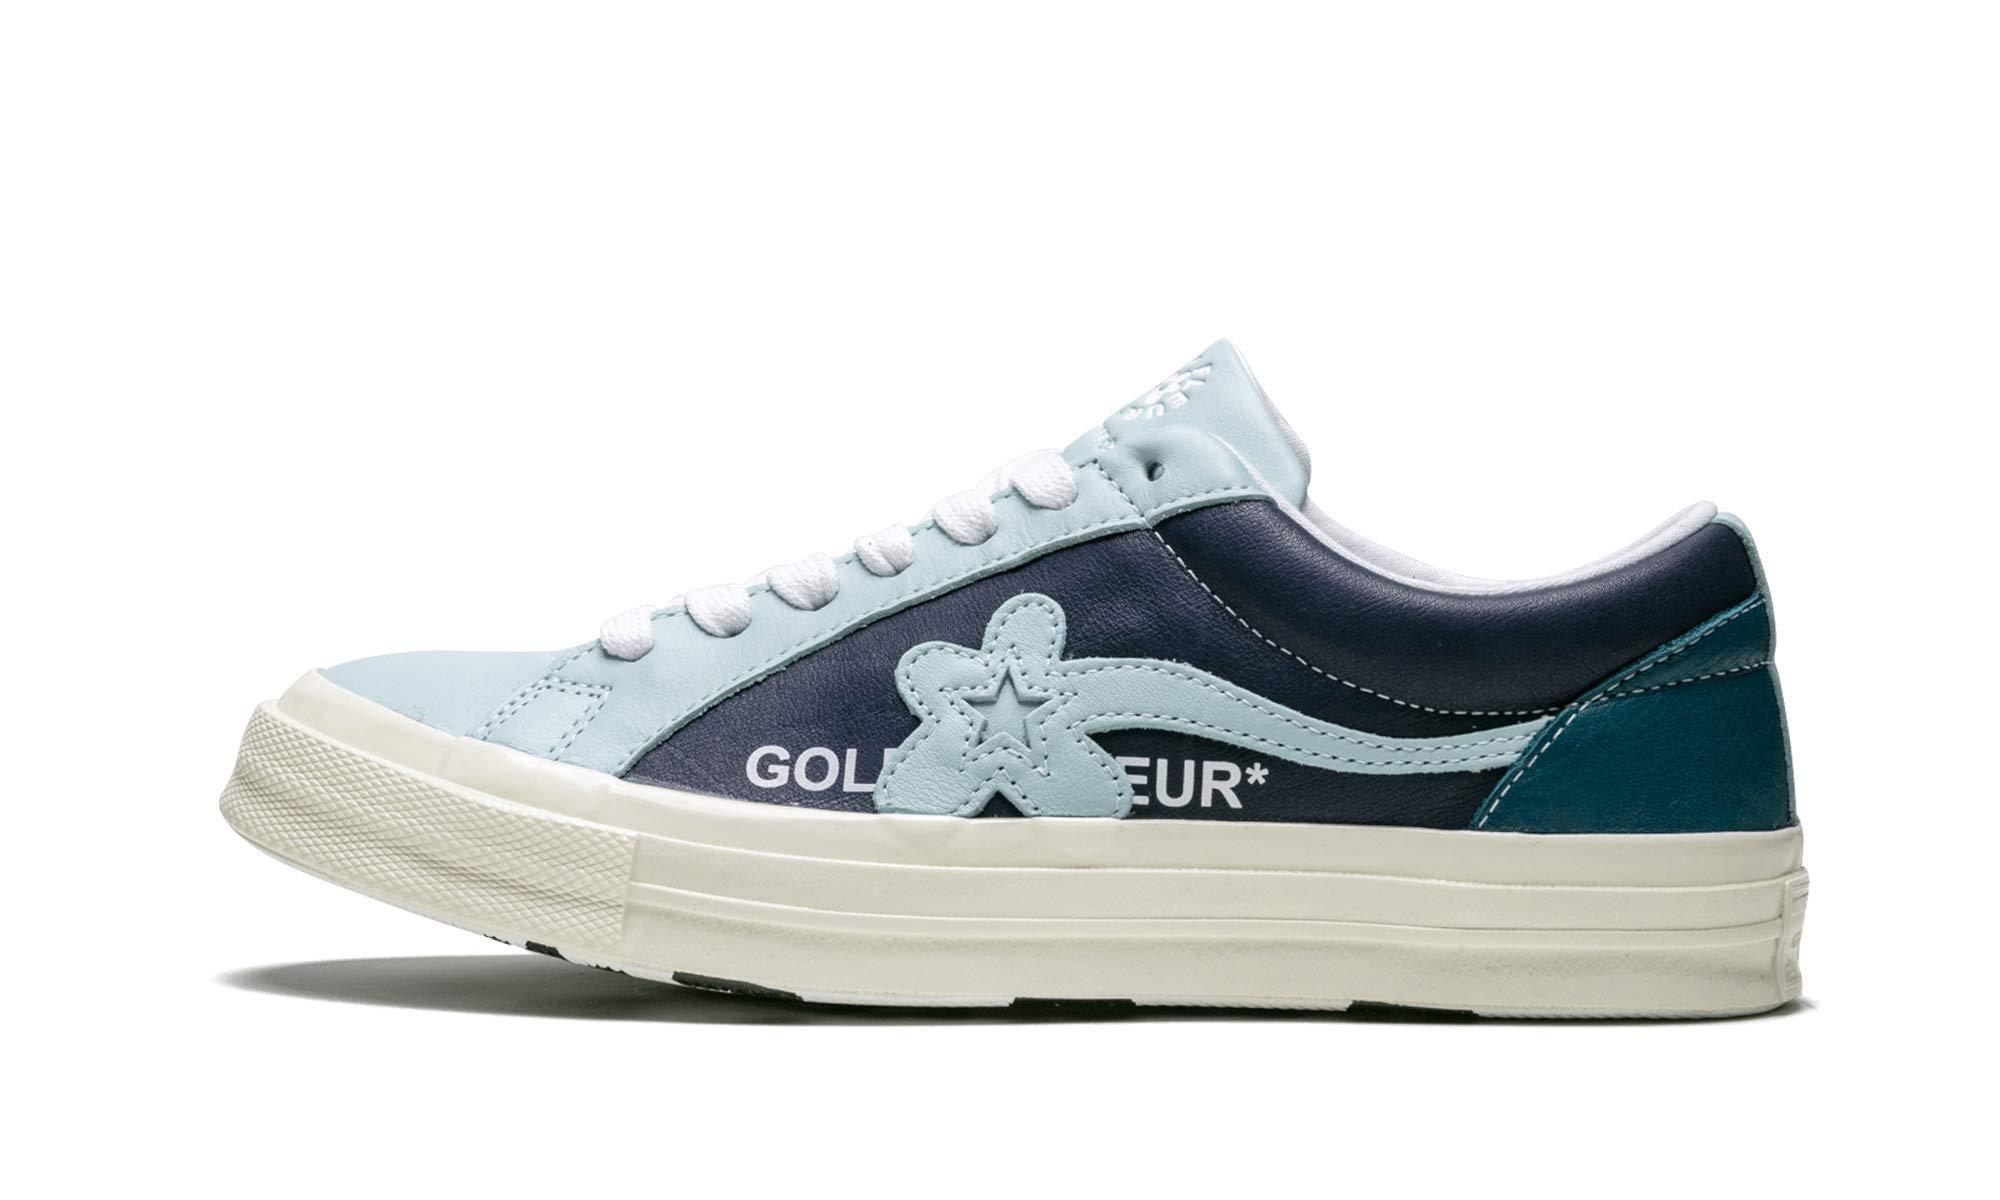 Converse Golf Le Fleur Ox (Barely Blue